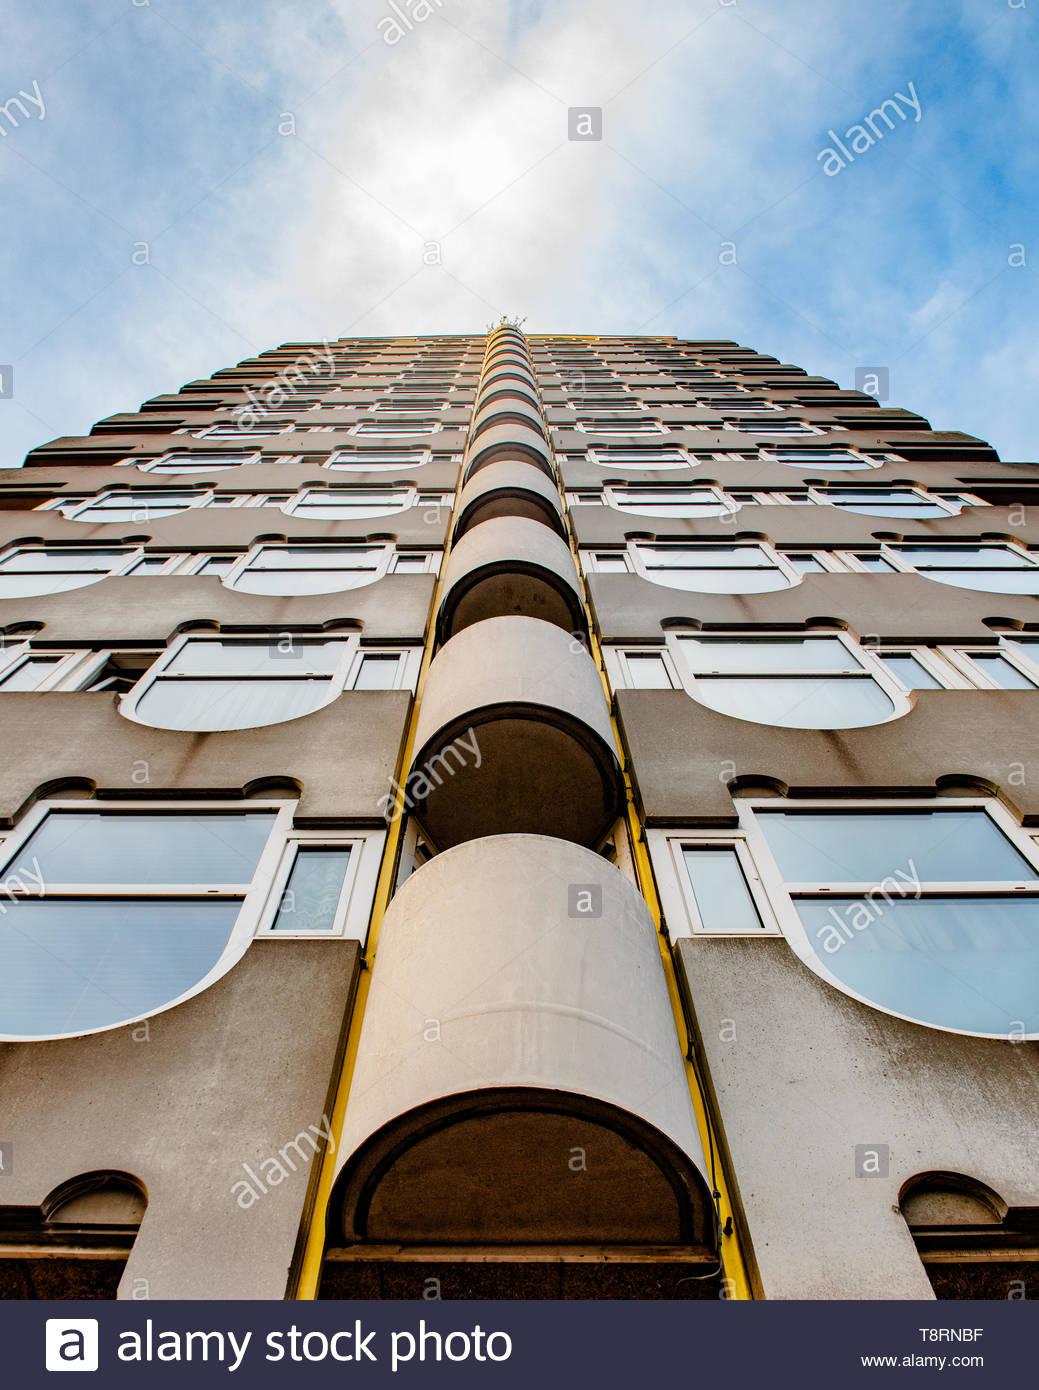 Modern architecture in Rotterdam Netherlands - European architecture - Rotterdam buildings - Rotterdam skyline - Stock Image